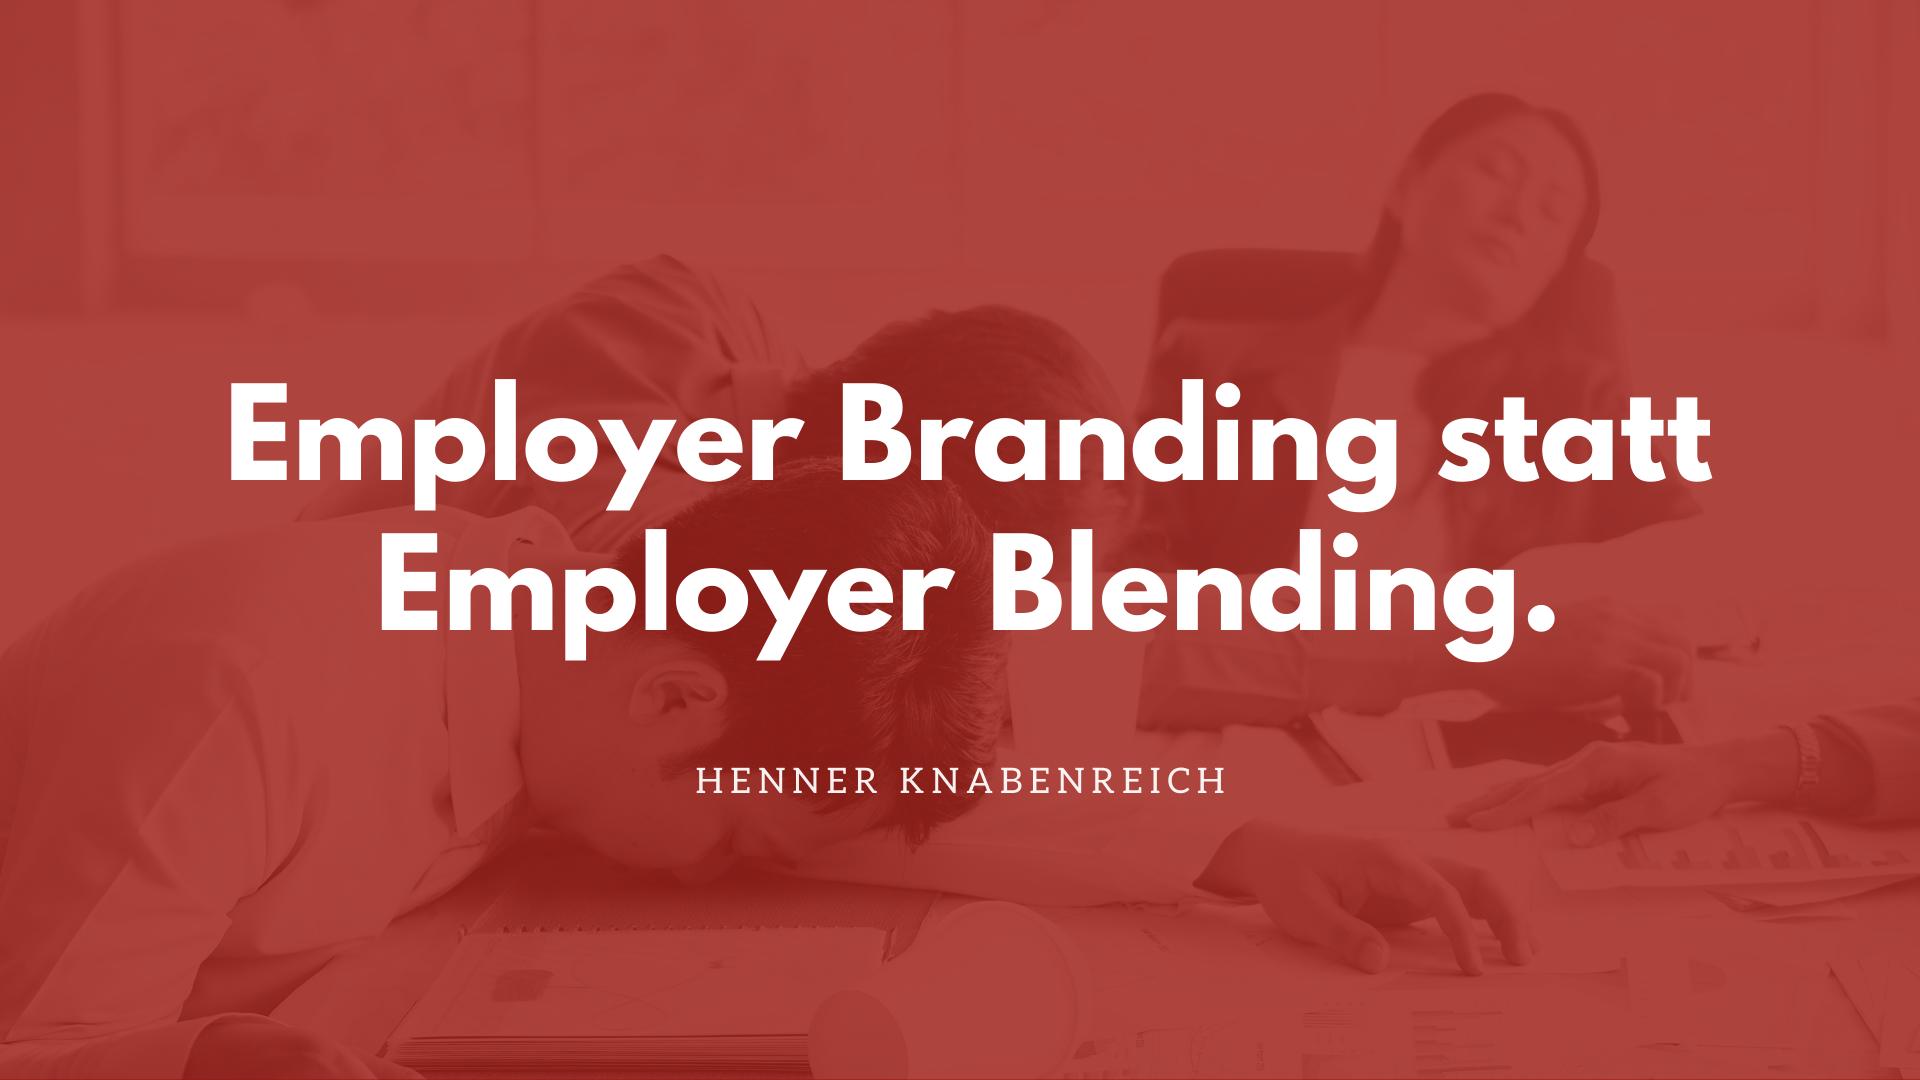 Employer Branding 2020 (1)